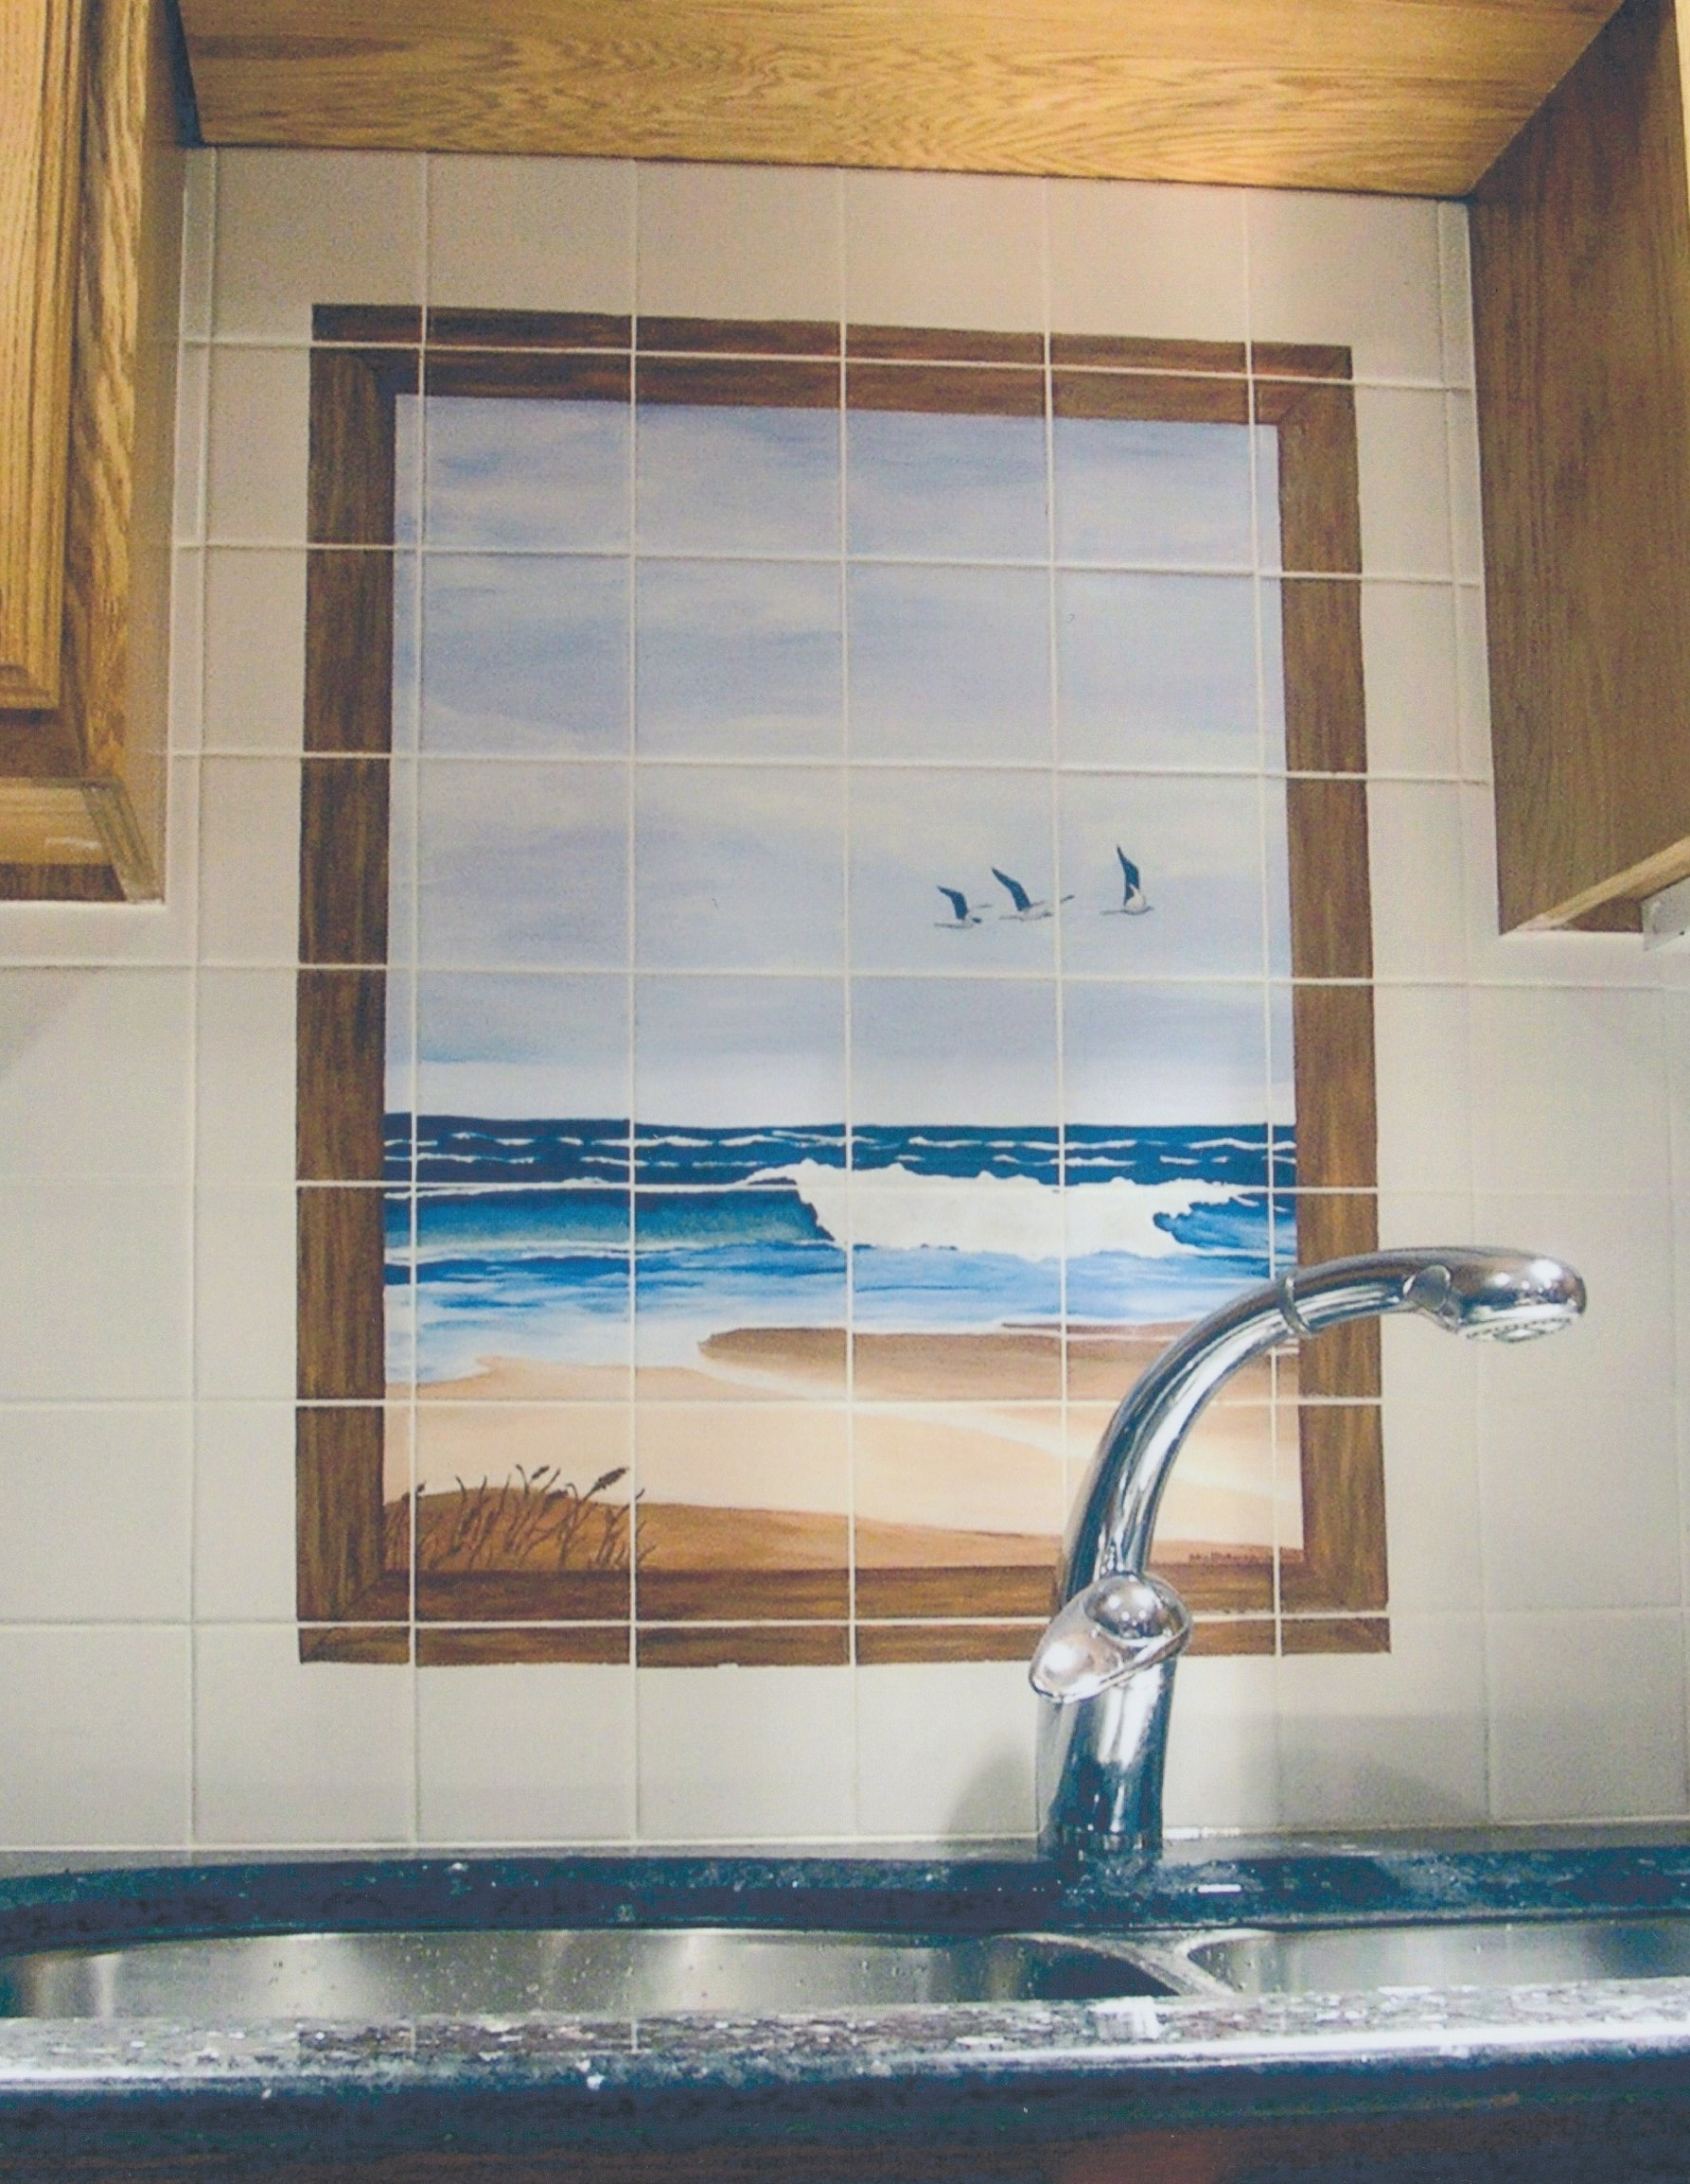 Trompe l'oeil, acrylic on tile